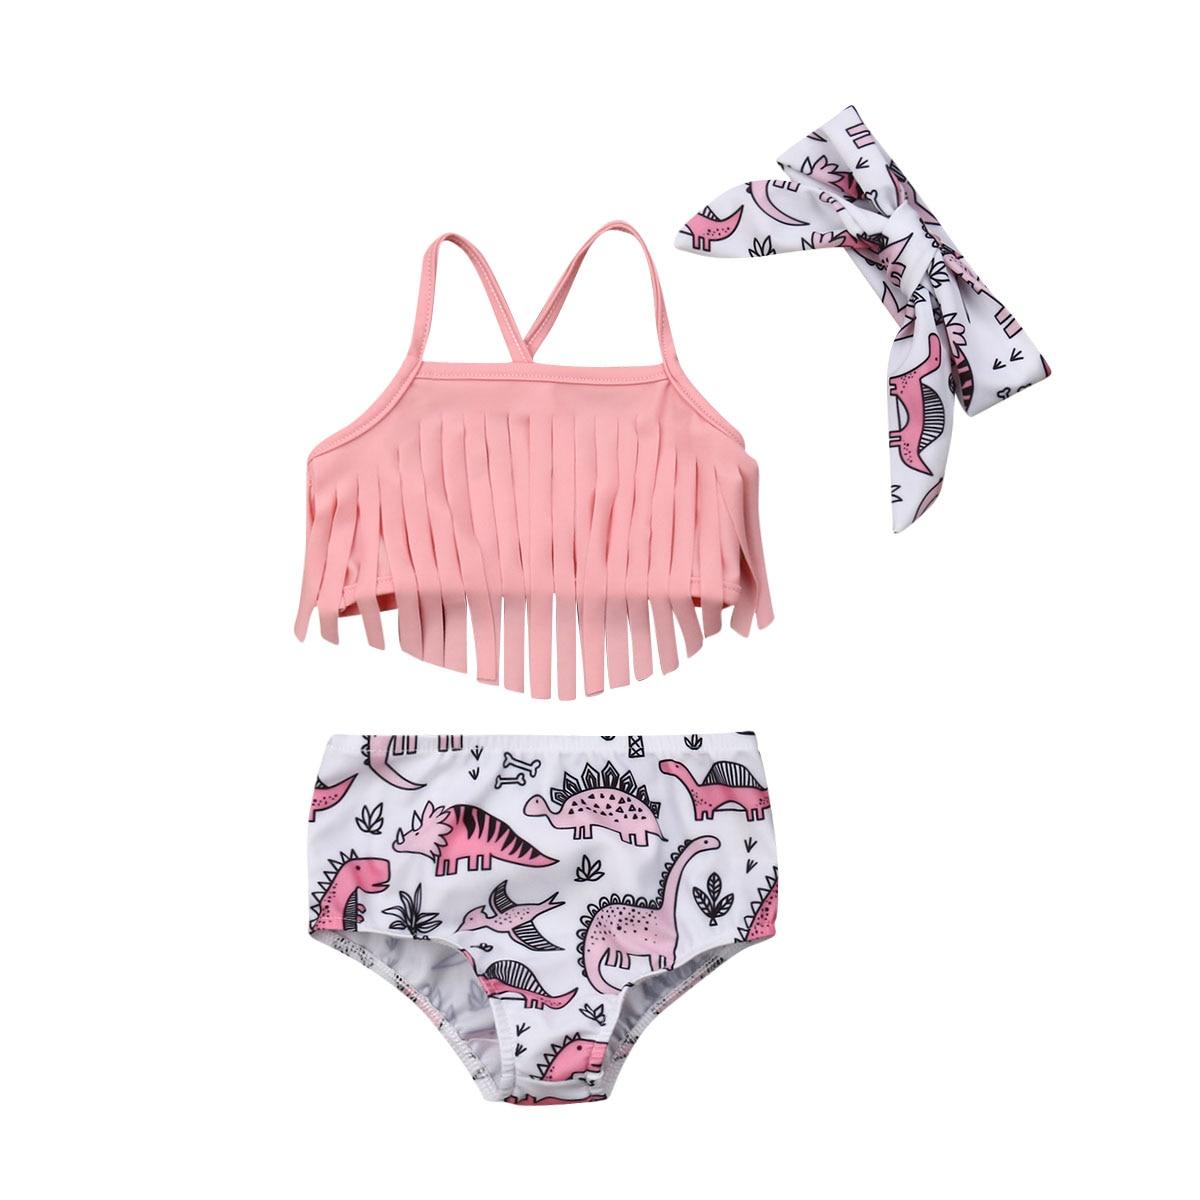 Baby Swimsuit 2019 New Summer Kids Girls Tassel Strap Tops Dinosaur Bottom Headband 3PCS Swimwear Beachwear Bathing Suit 0-24M